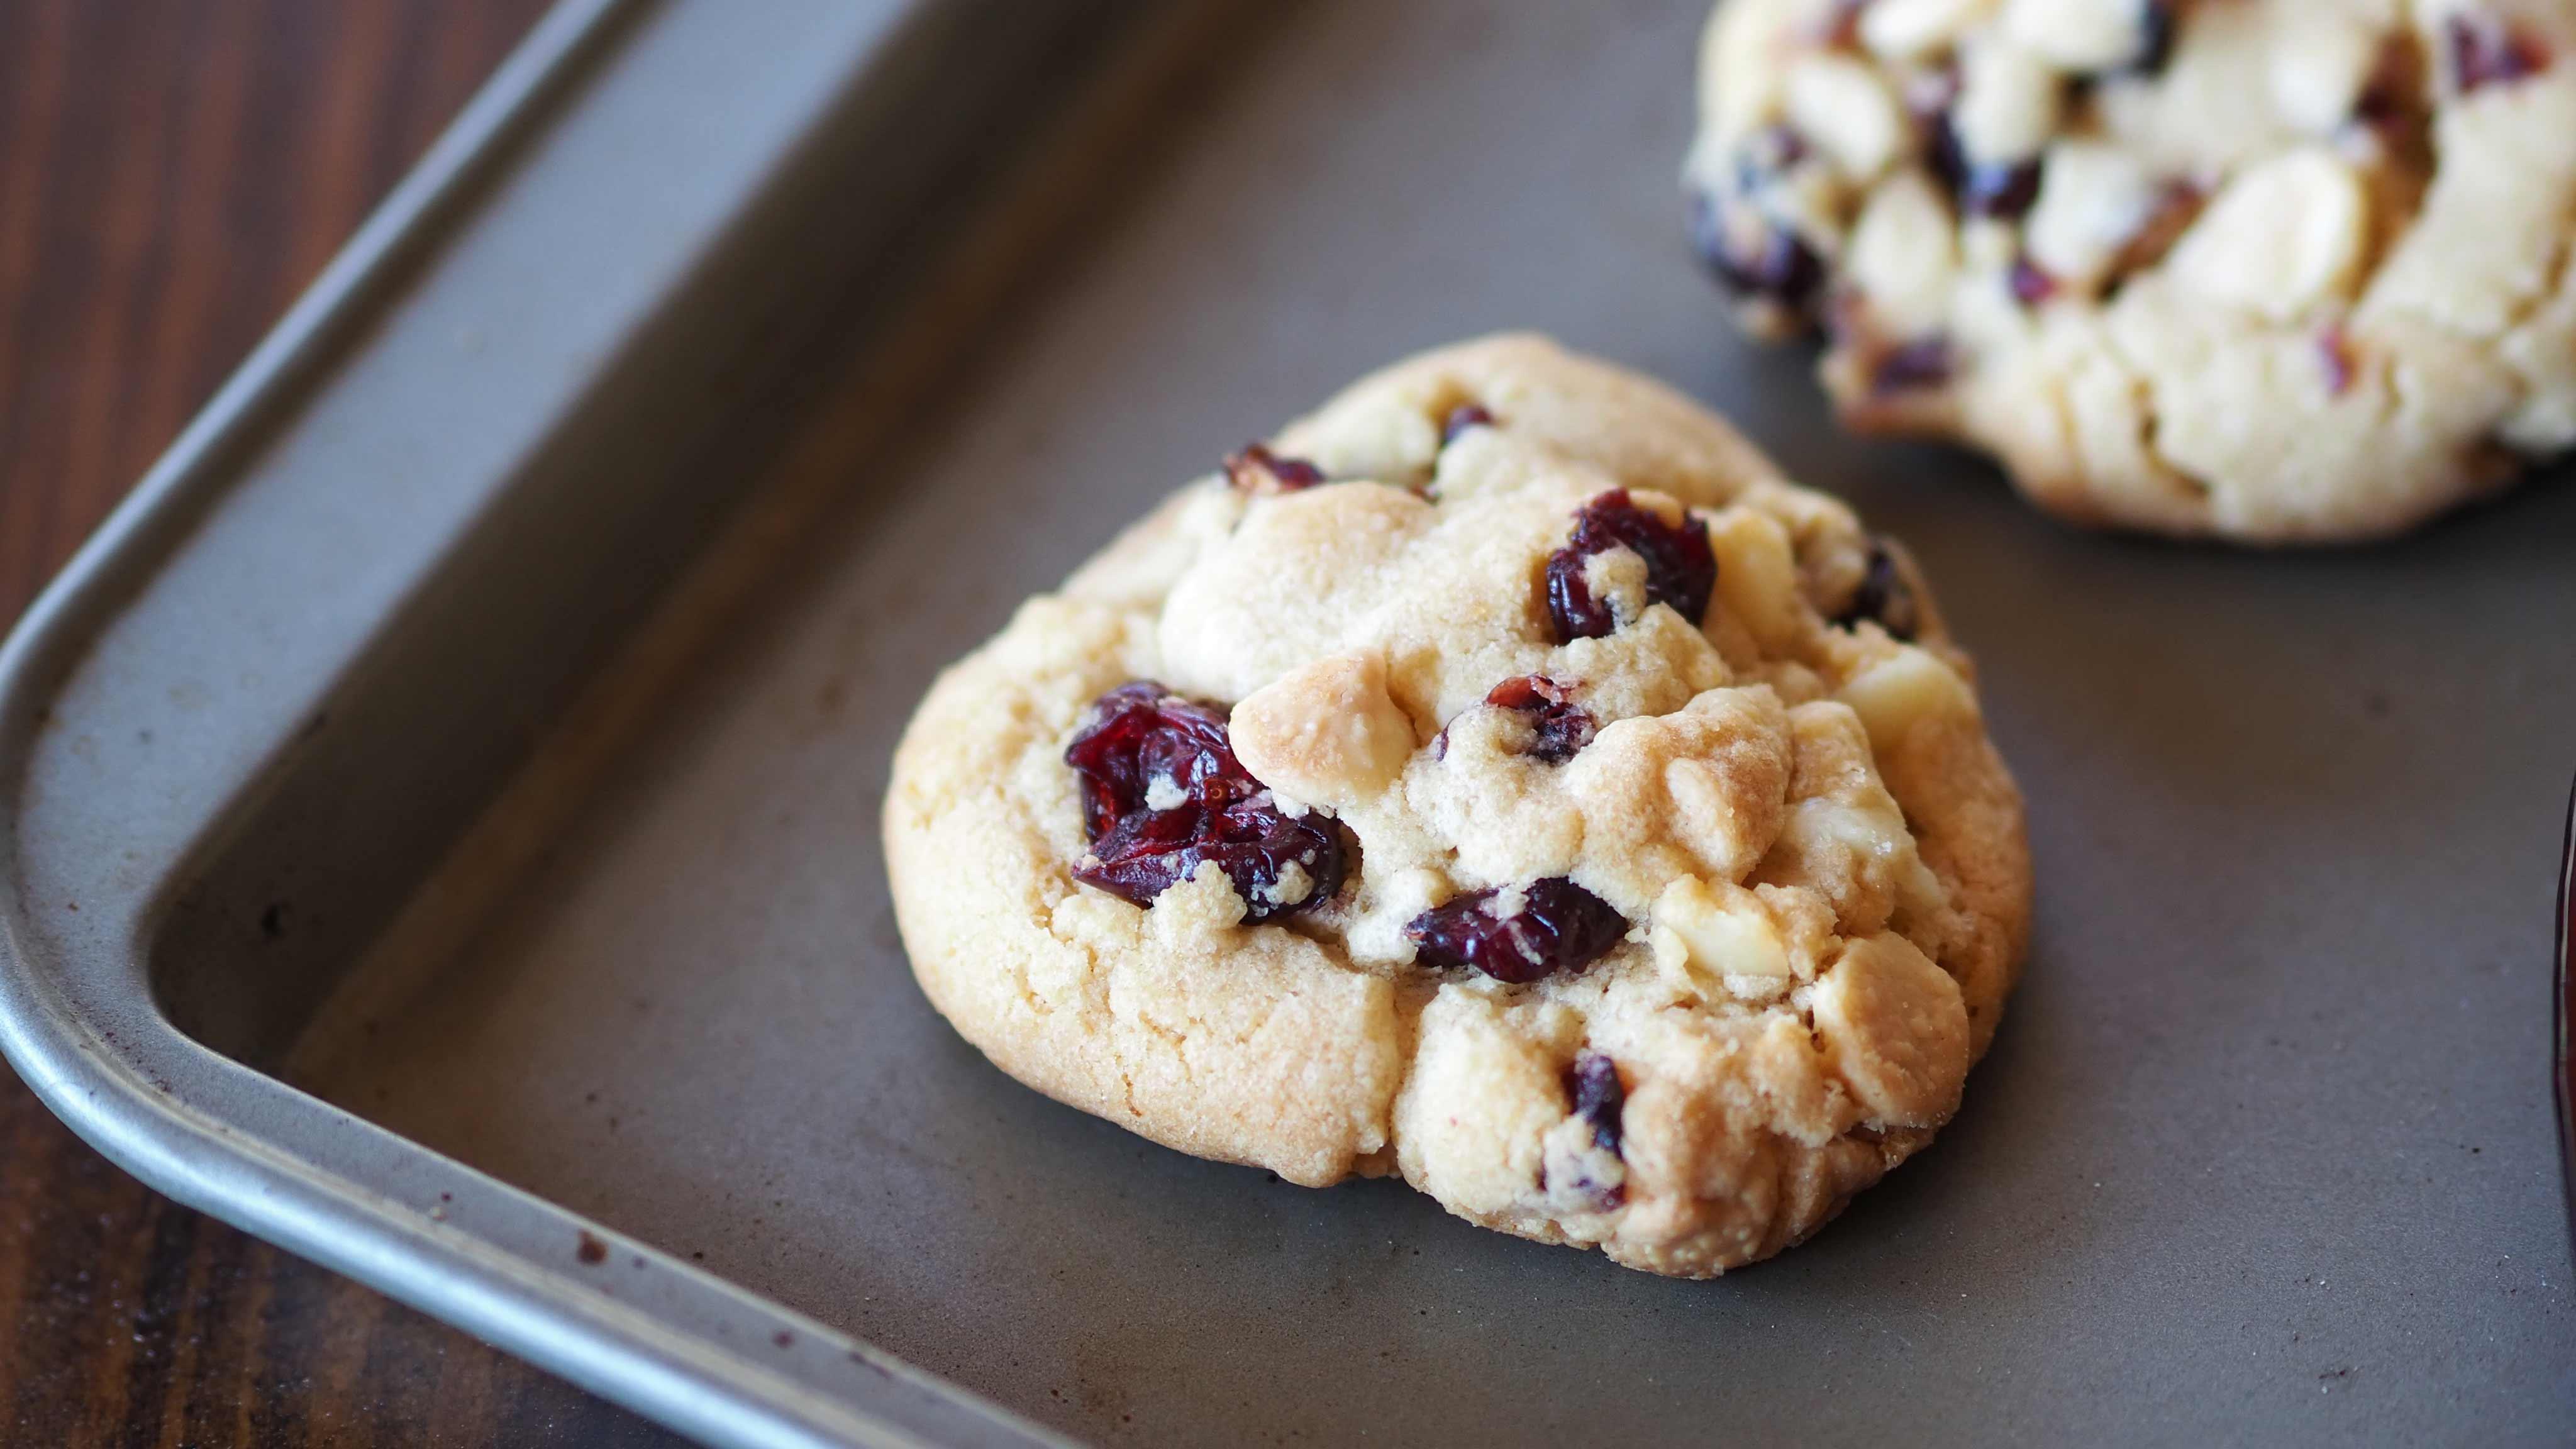 Image for Recipe White Chocolate Macadamia Nut Cookies